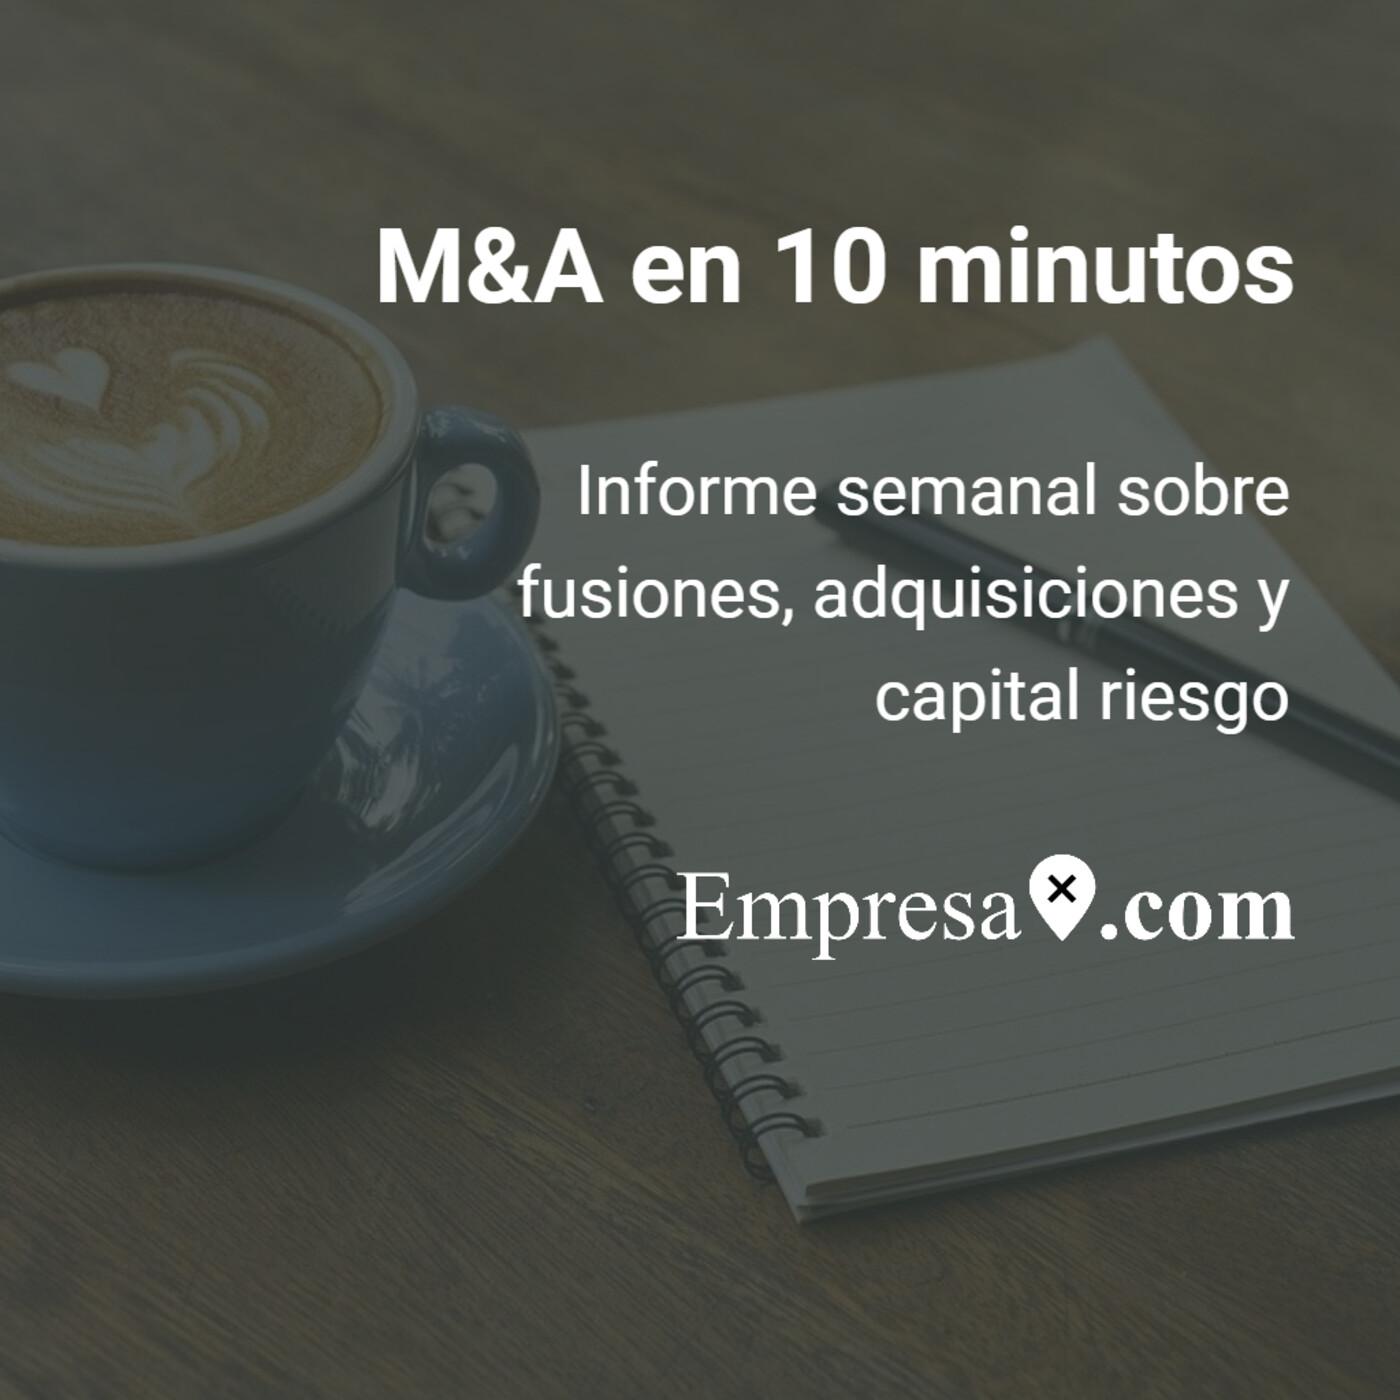 M&A en 10 minutos: Applus, Izertis, Vitaldent